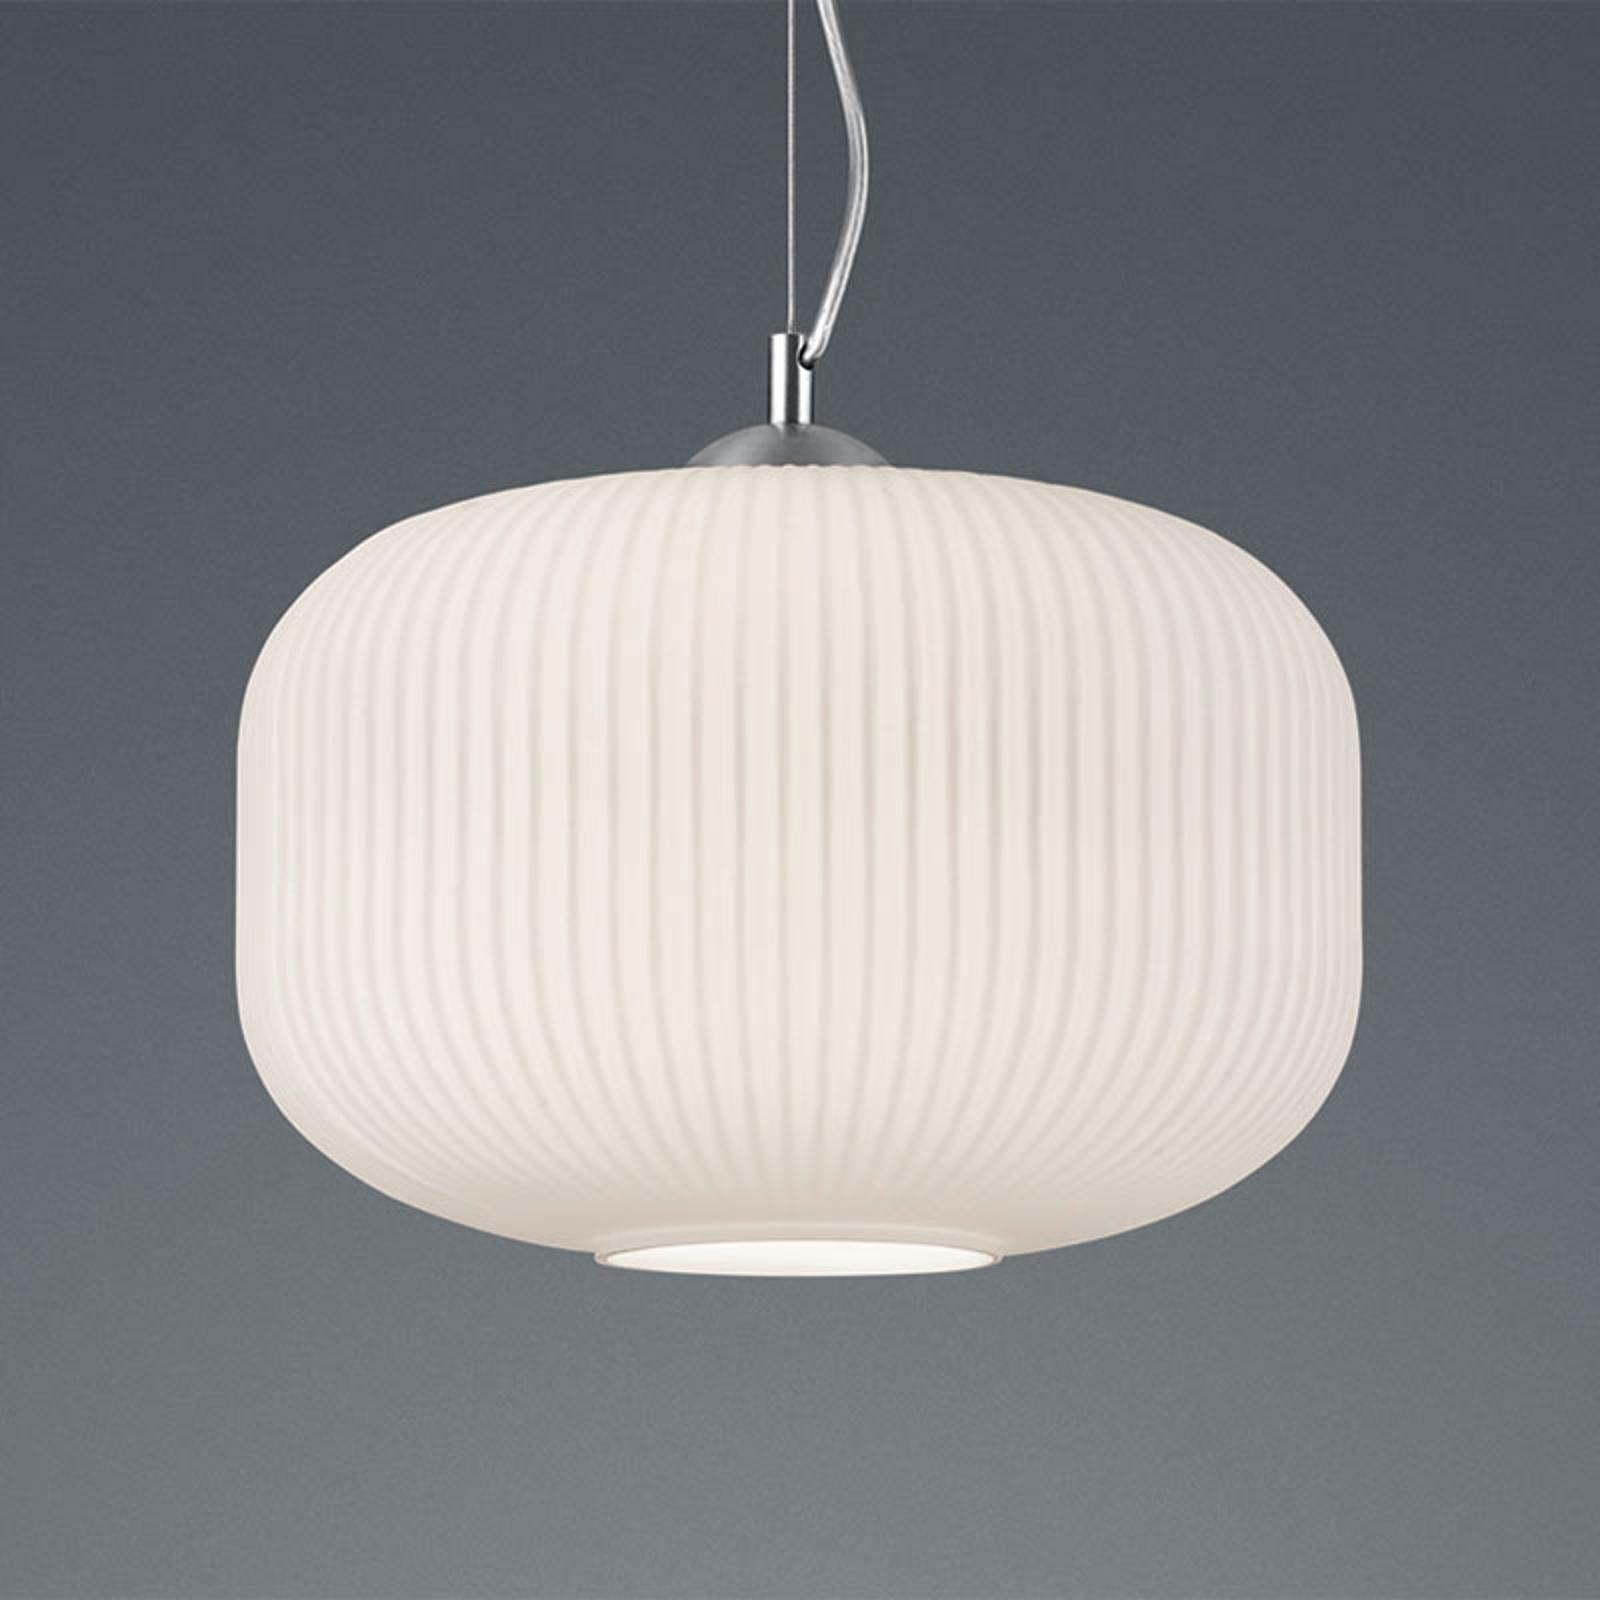 Hanglamp Kilian met glazen kap, wit